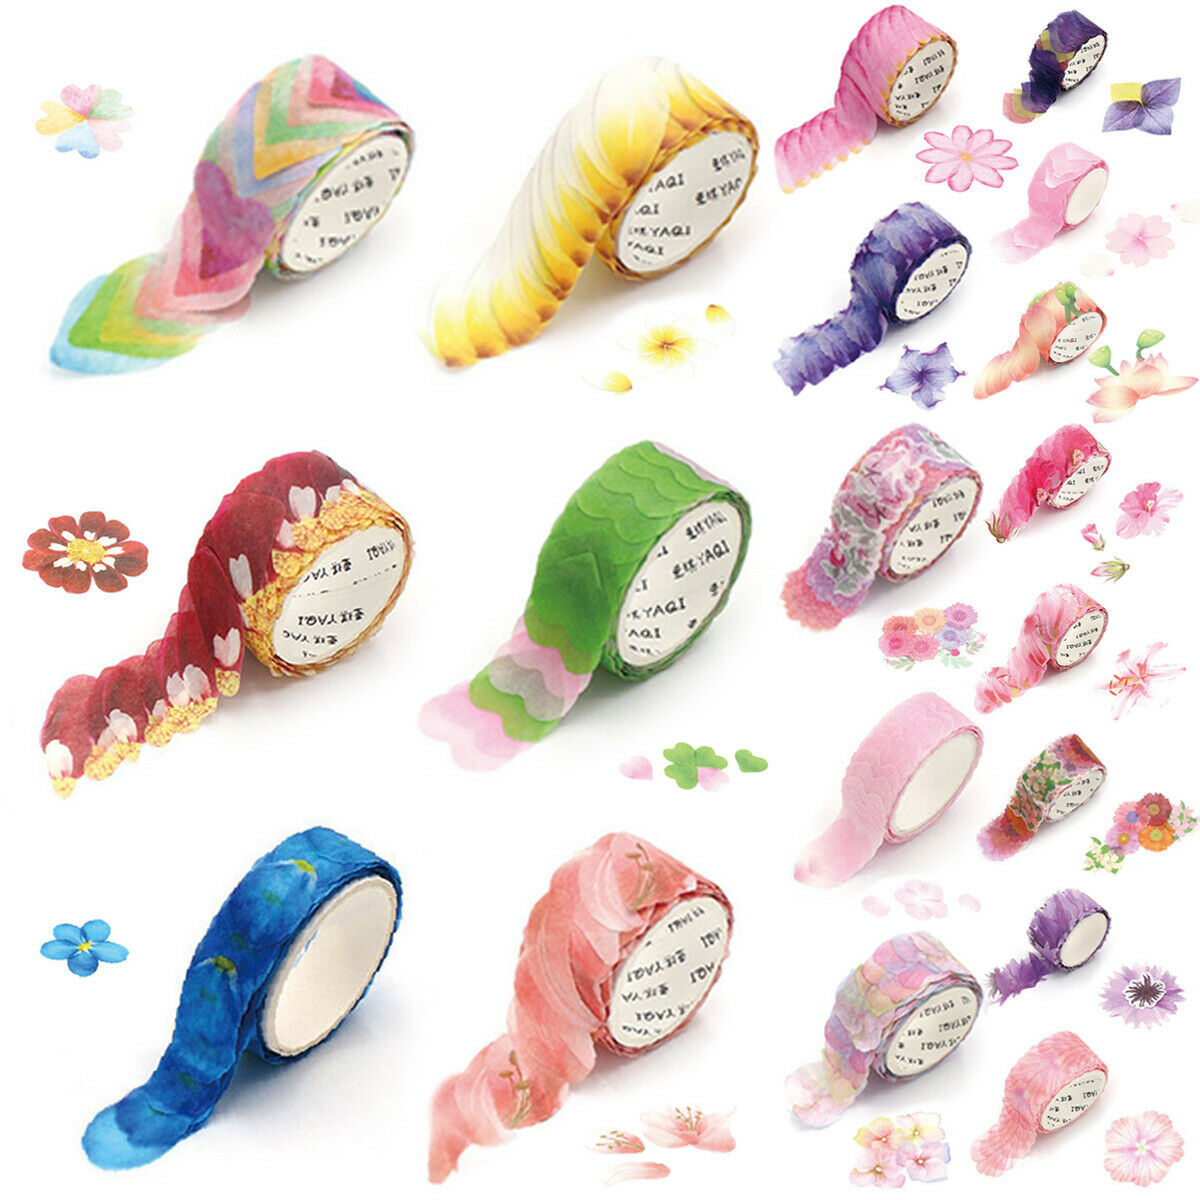 200PCS/Roll Masking Petals Tape Washi Tape Scrapbook Sticker Sticky Paper Flower